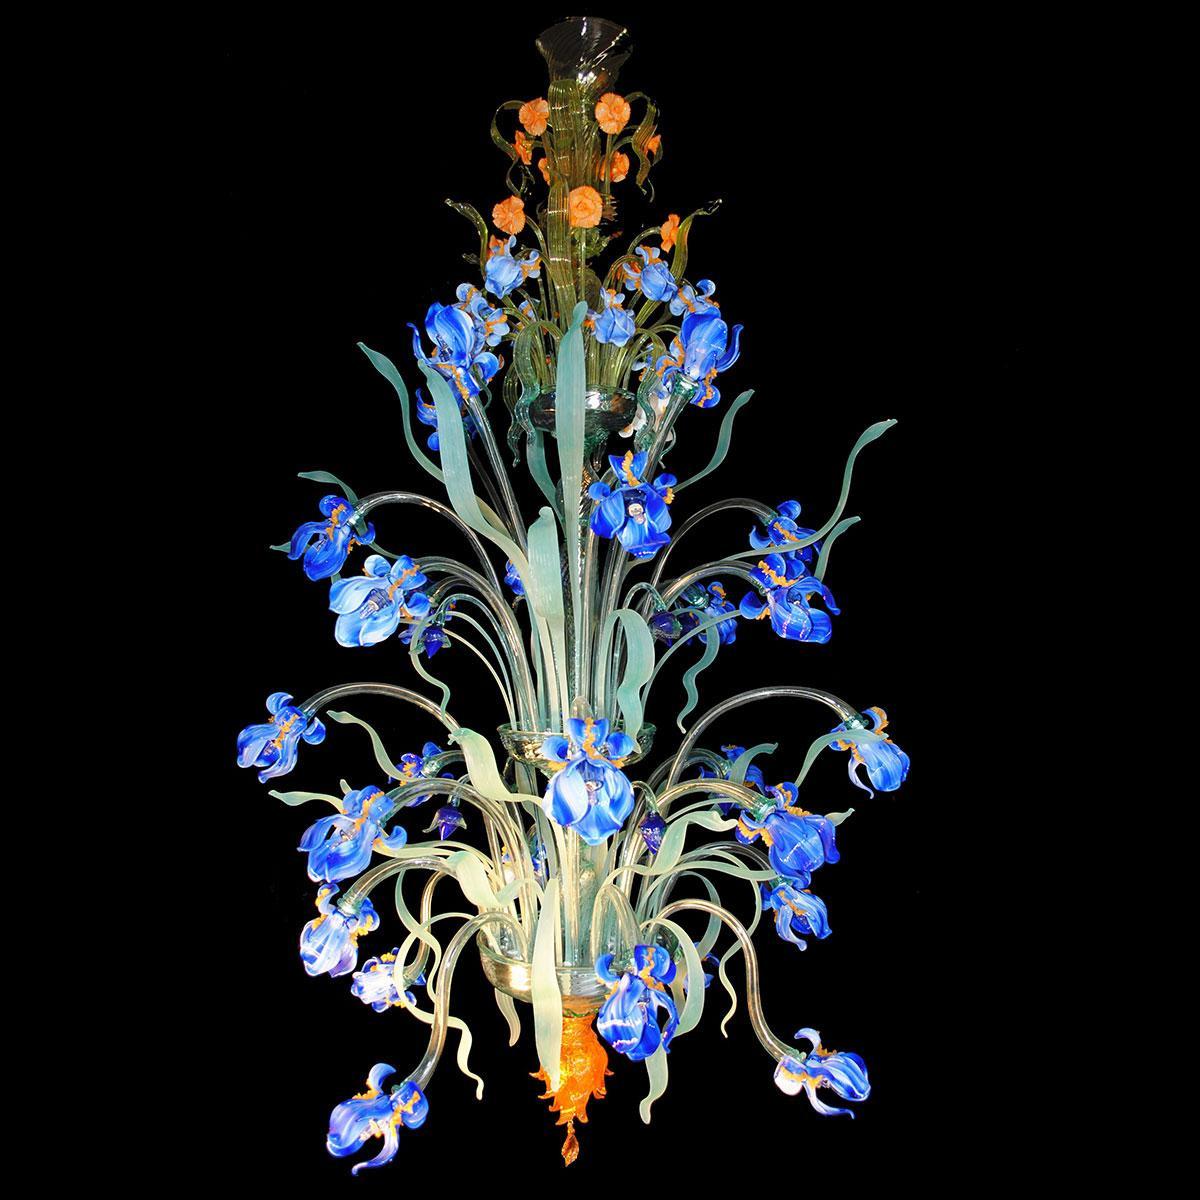 """Iris Blu"" große Murano Kronleuchter - 24 flammig - blau"